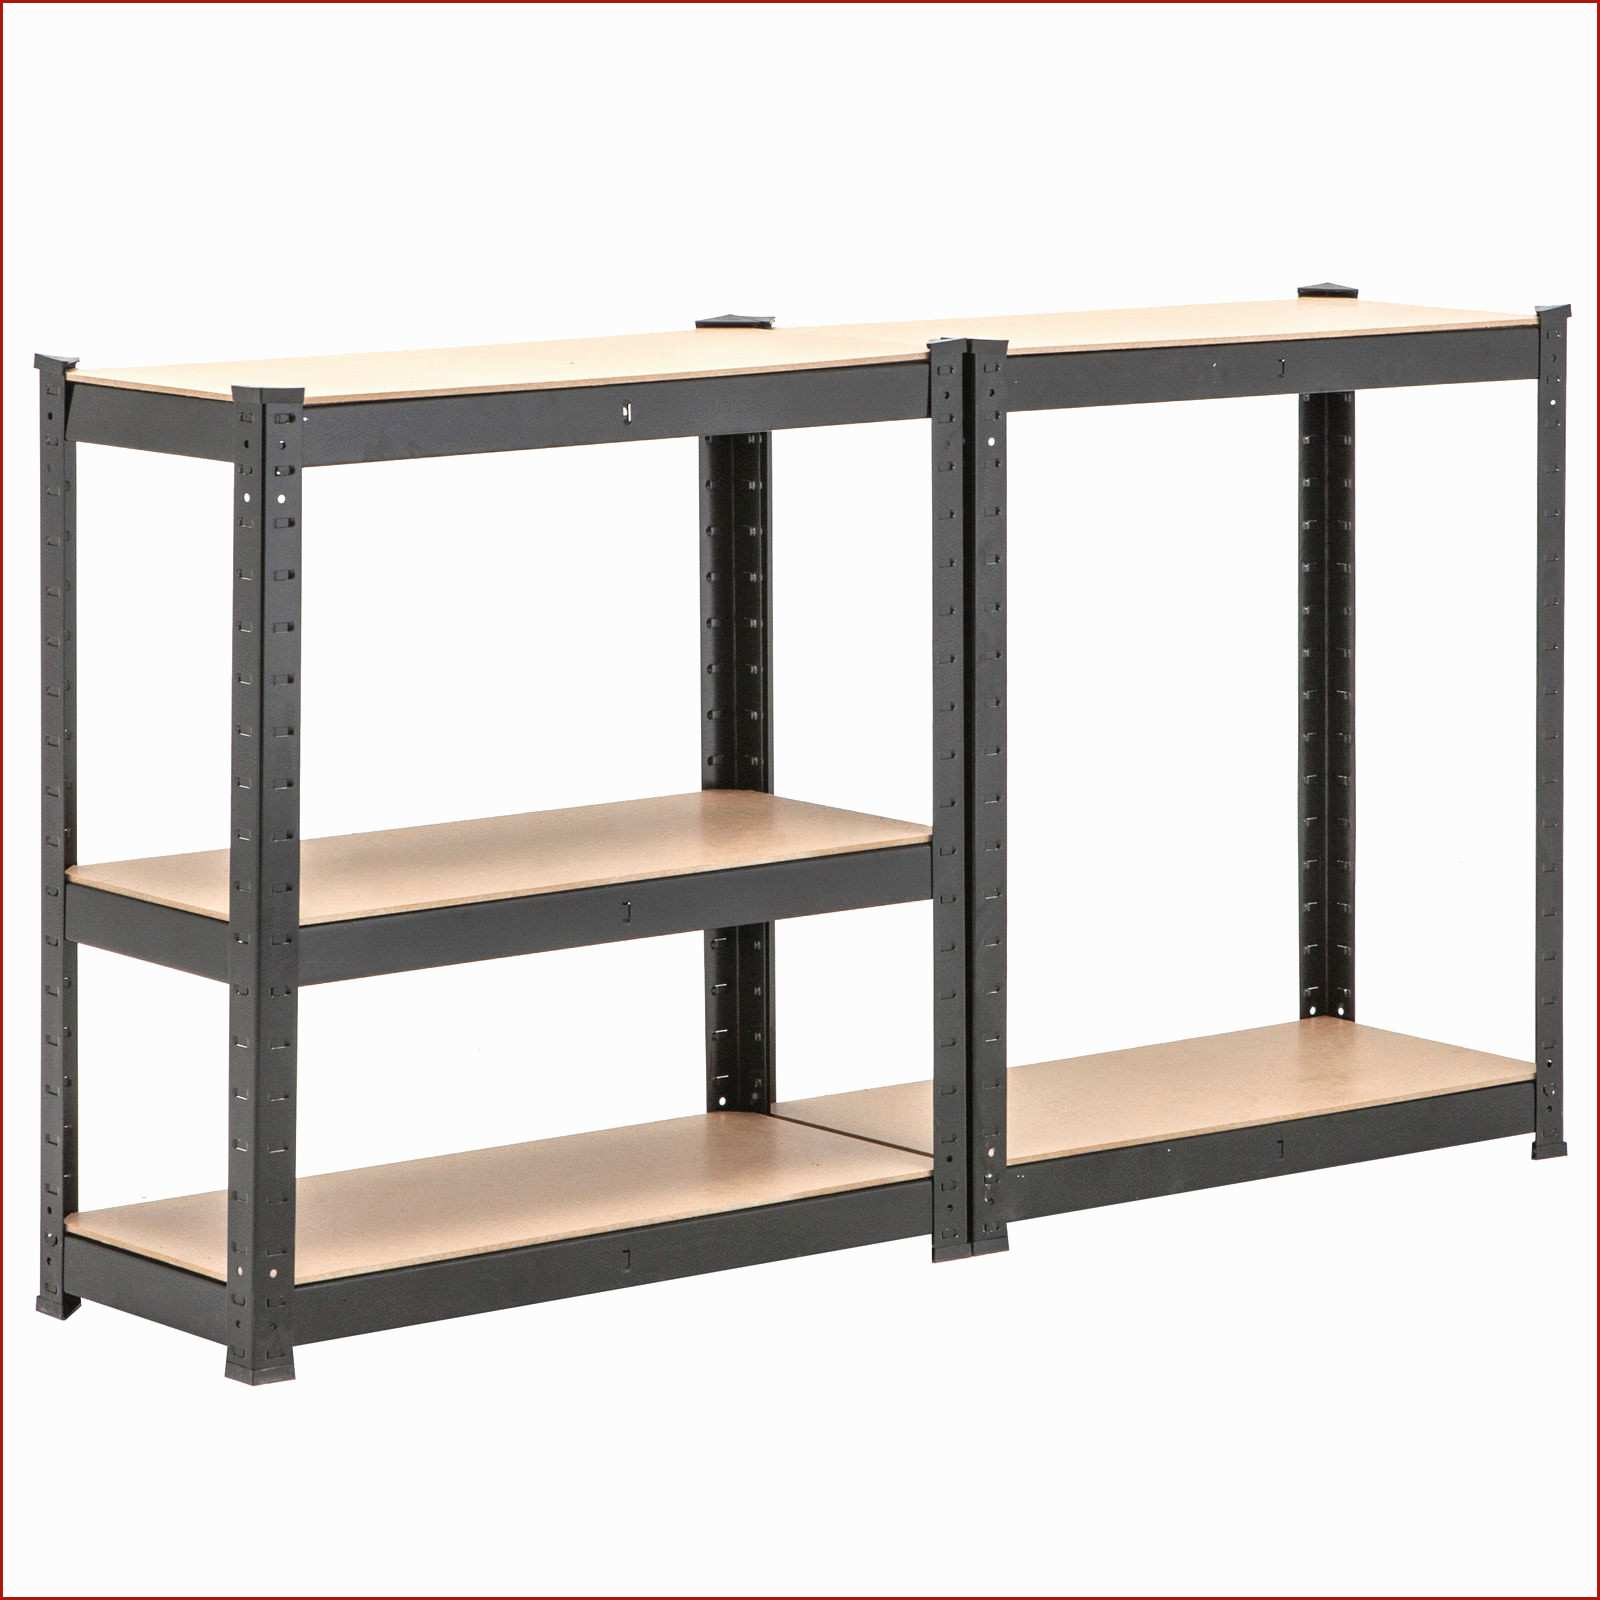 Boltless Steel Shelving Rack With 3 Adjustable Shelves